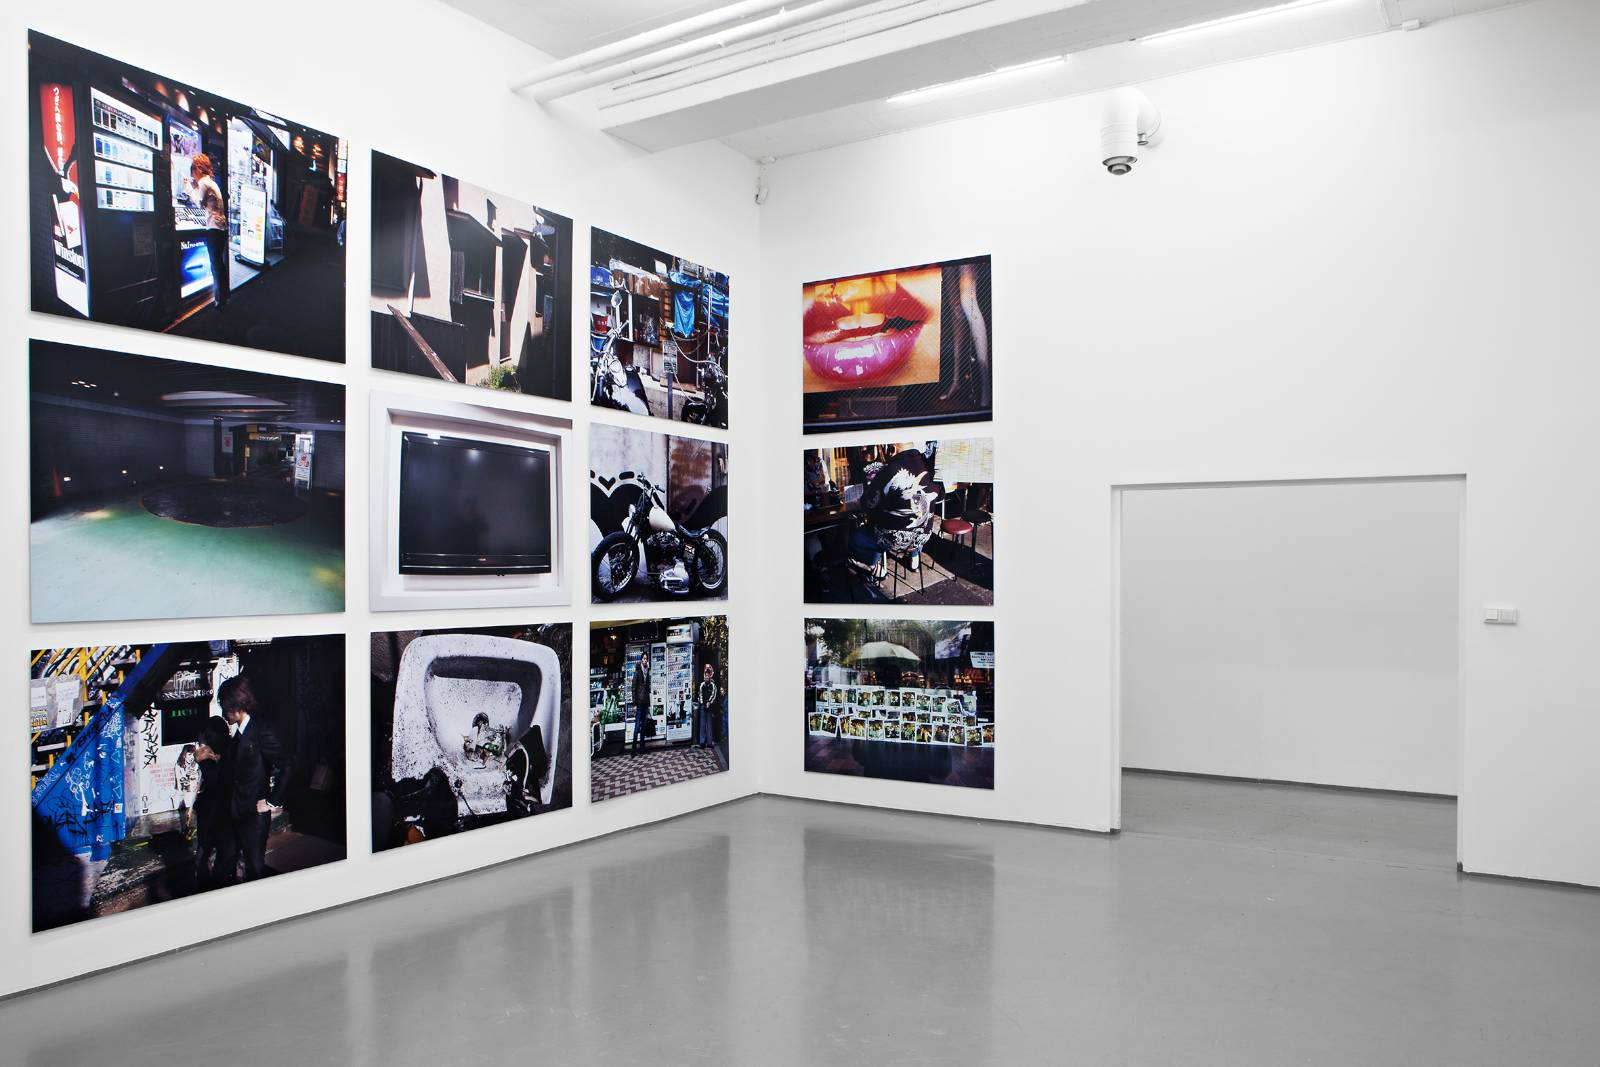 Installation view, Daido Moriyama, Color, Gallery Riis, Oslo, 2012